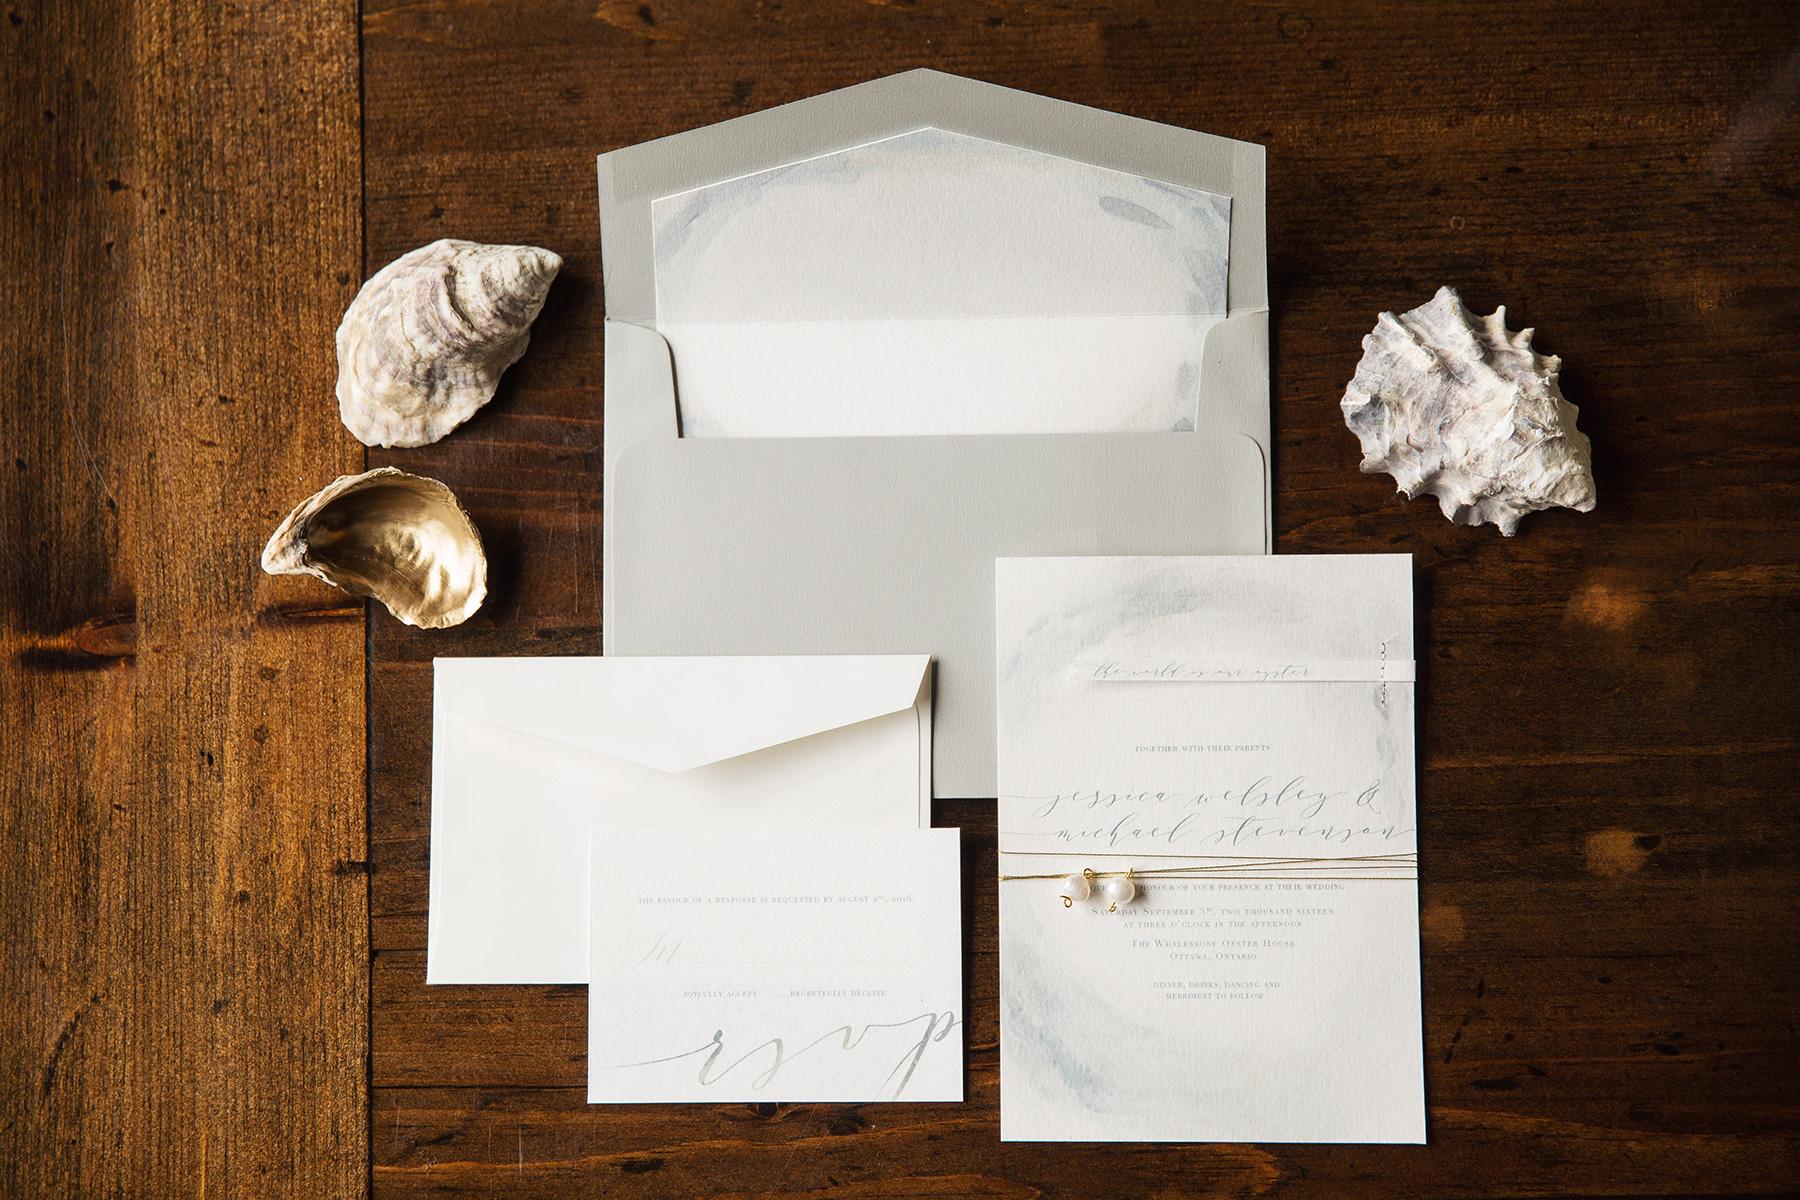 LaFabere_wedding-invitation_Oyster_01.jpg